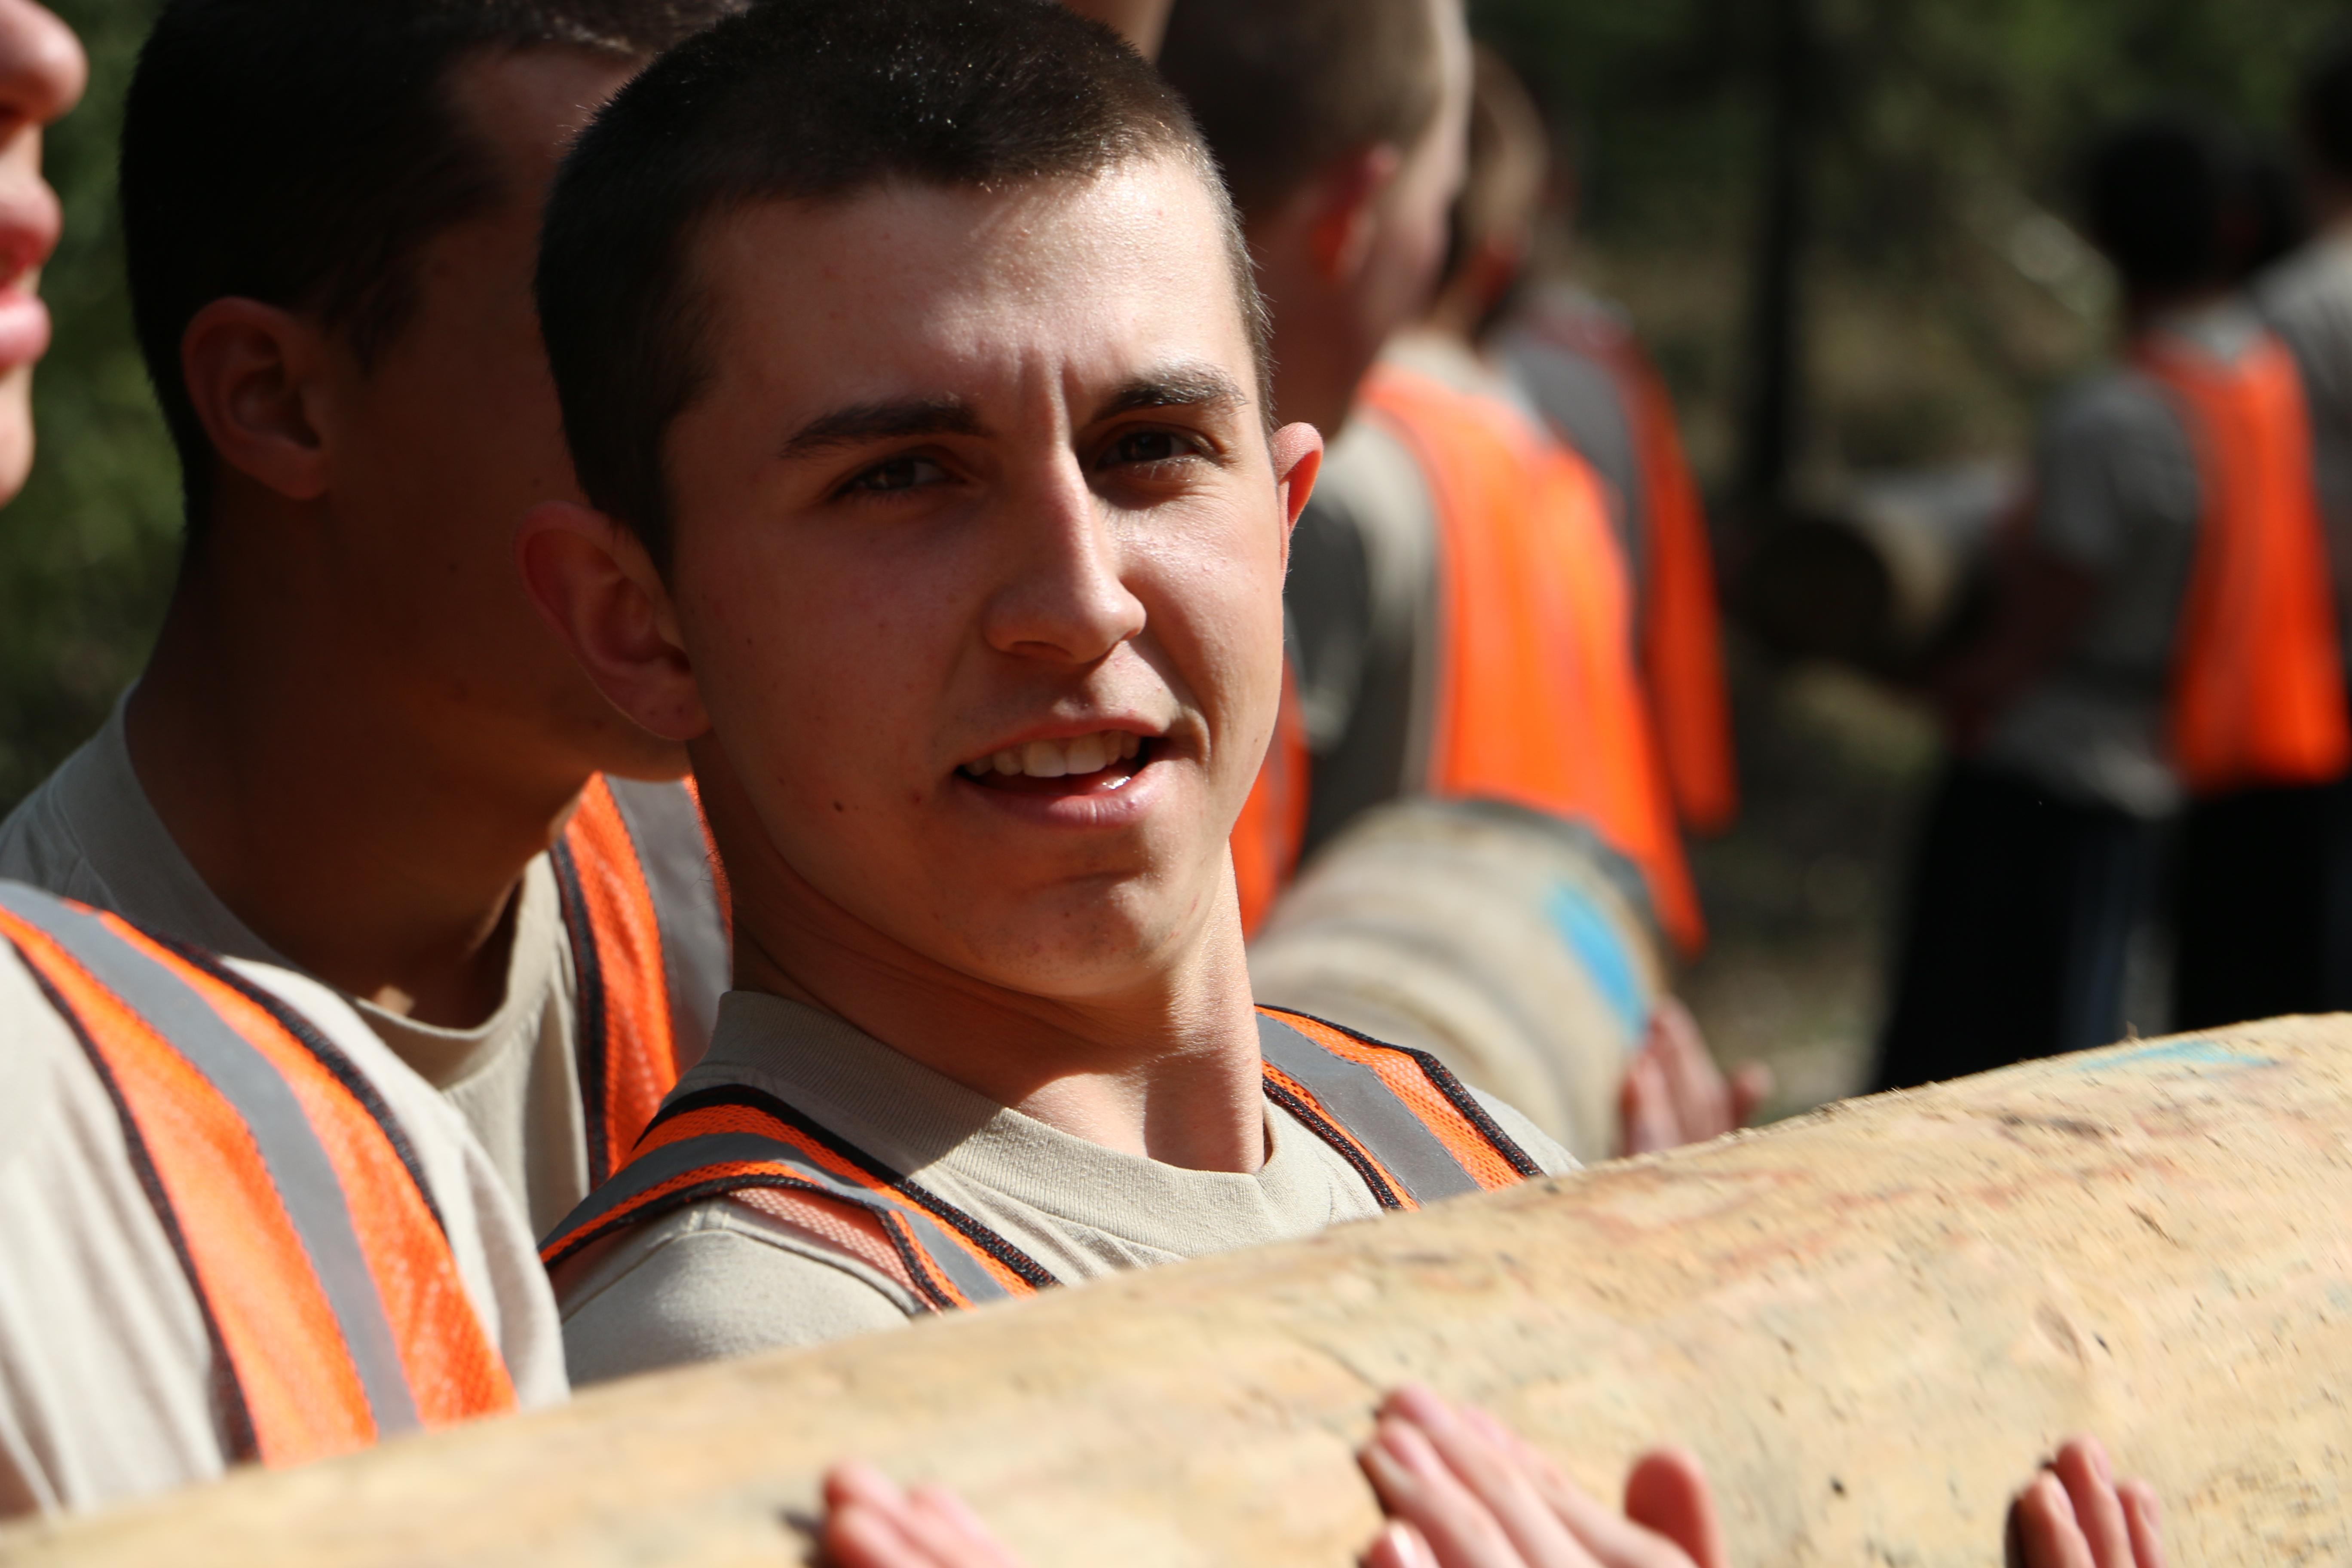 Cadet Turner